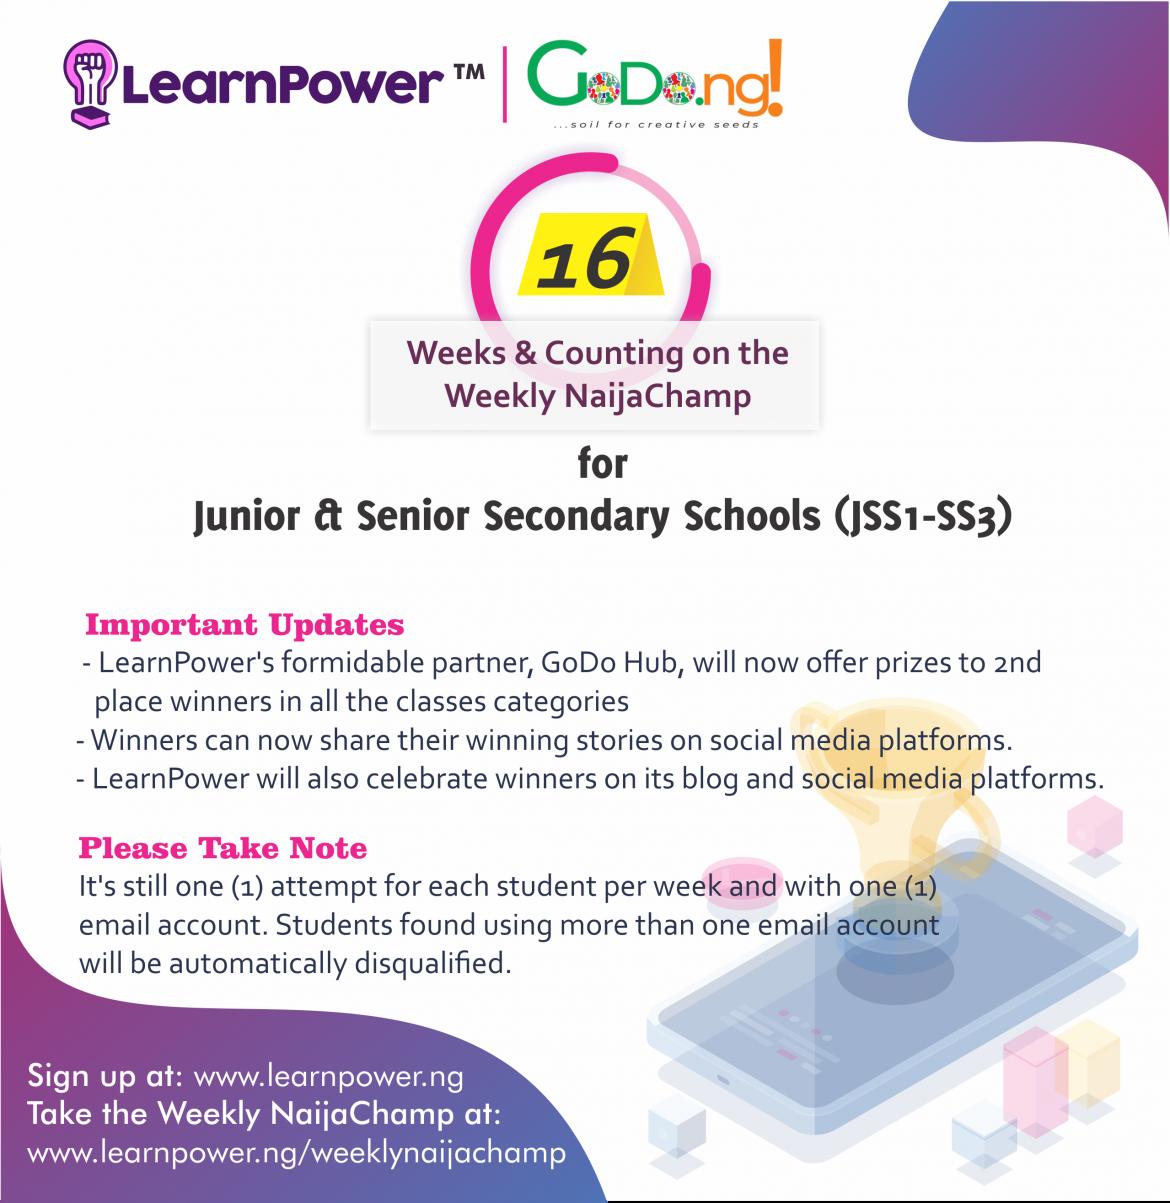 LearnPower GodoHub partnership